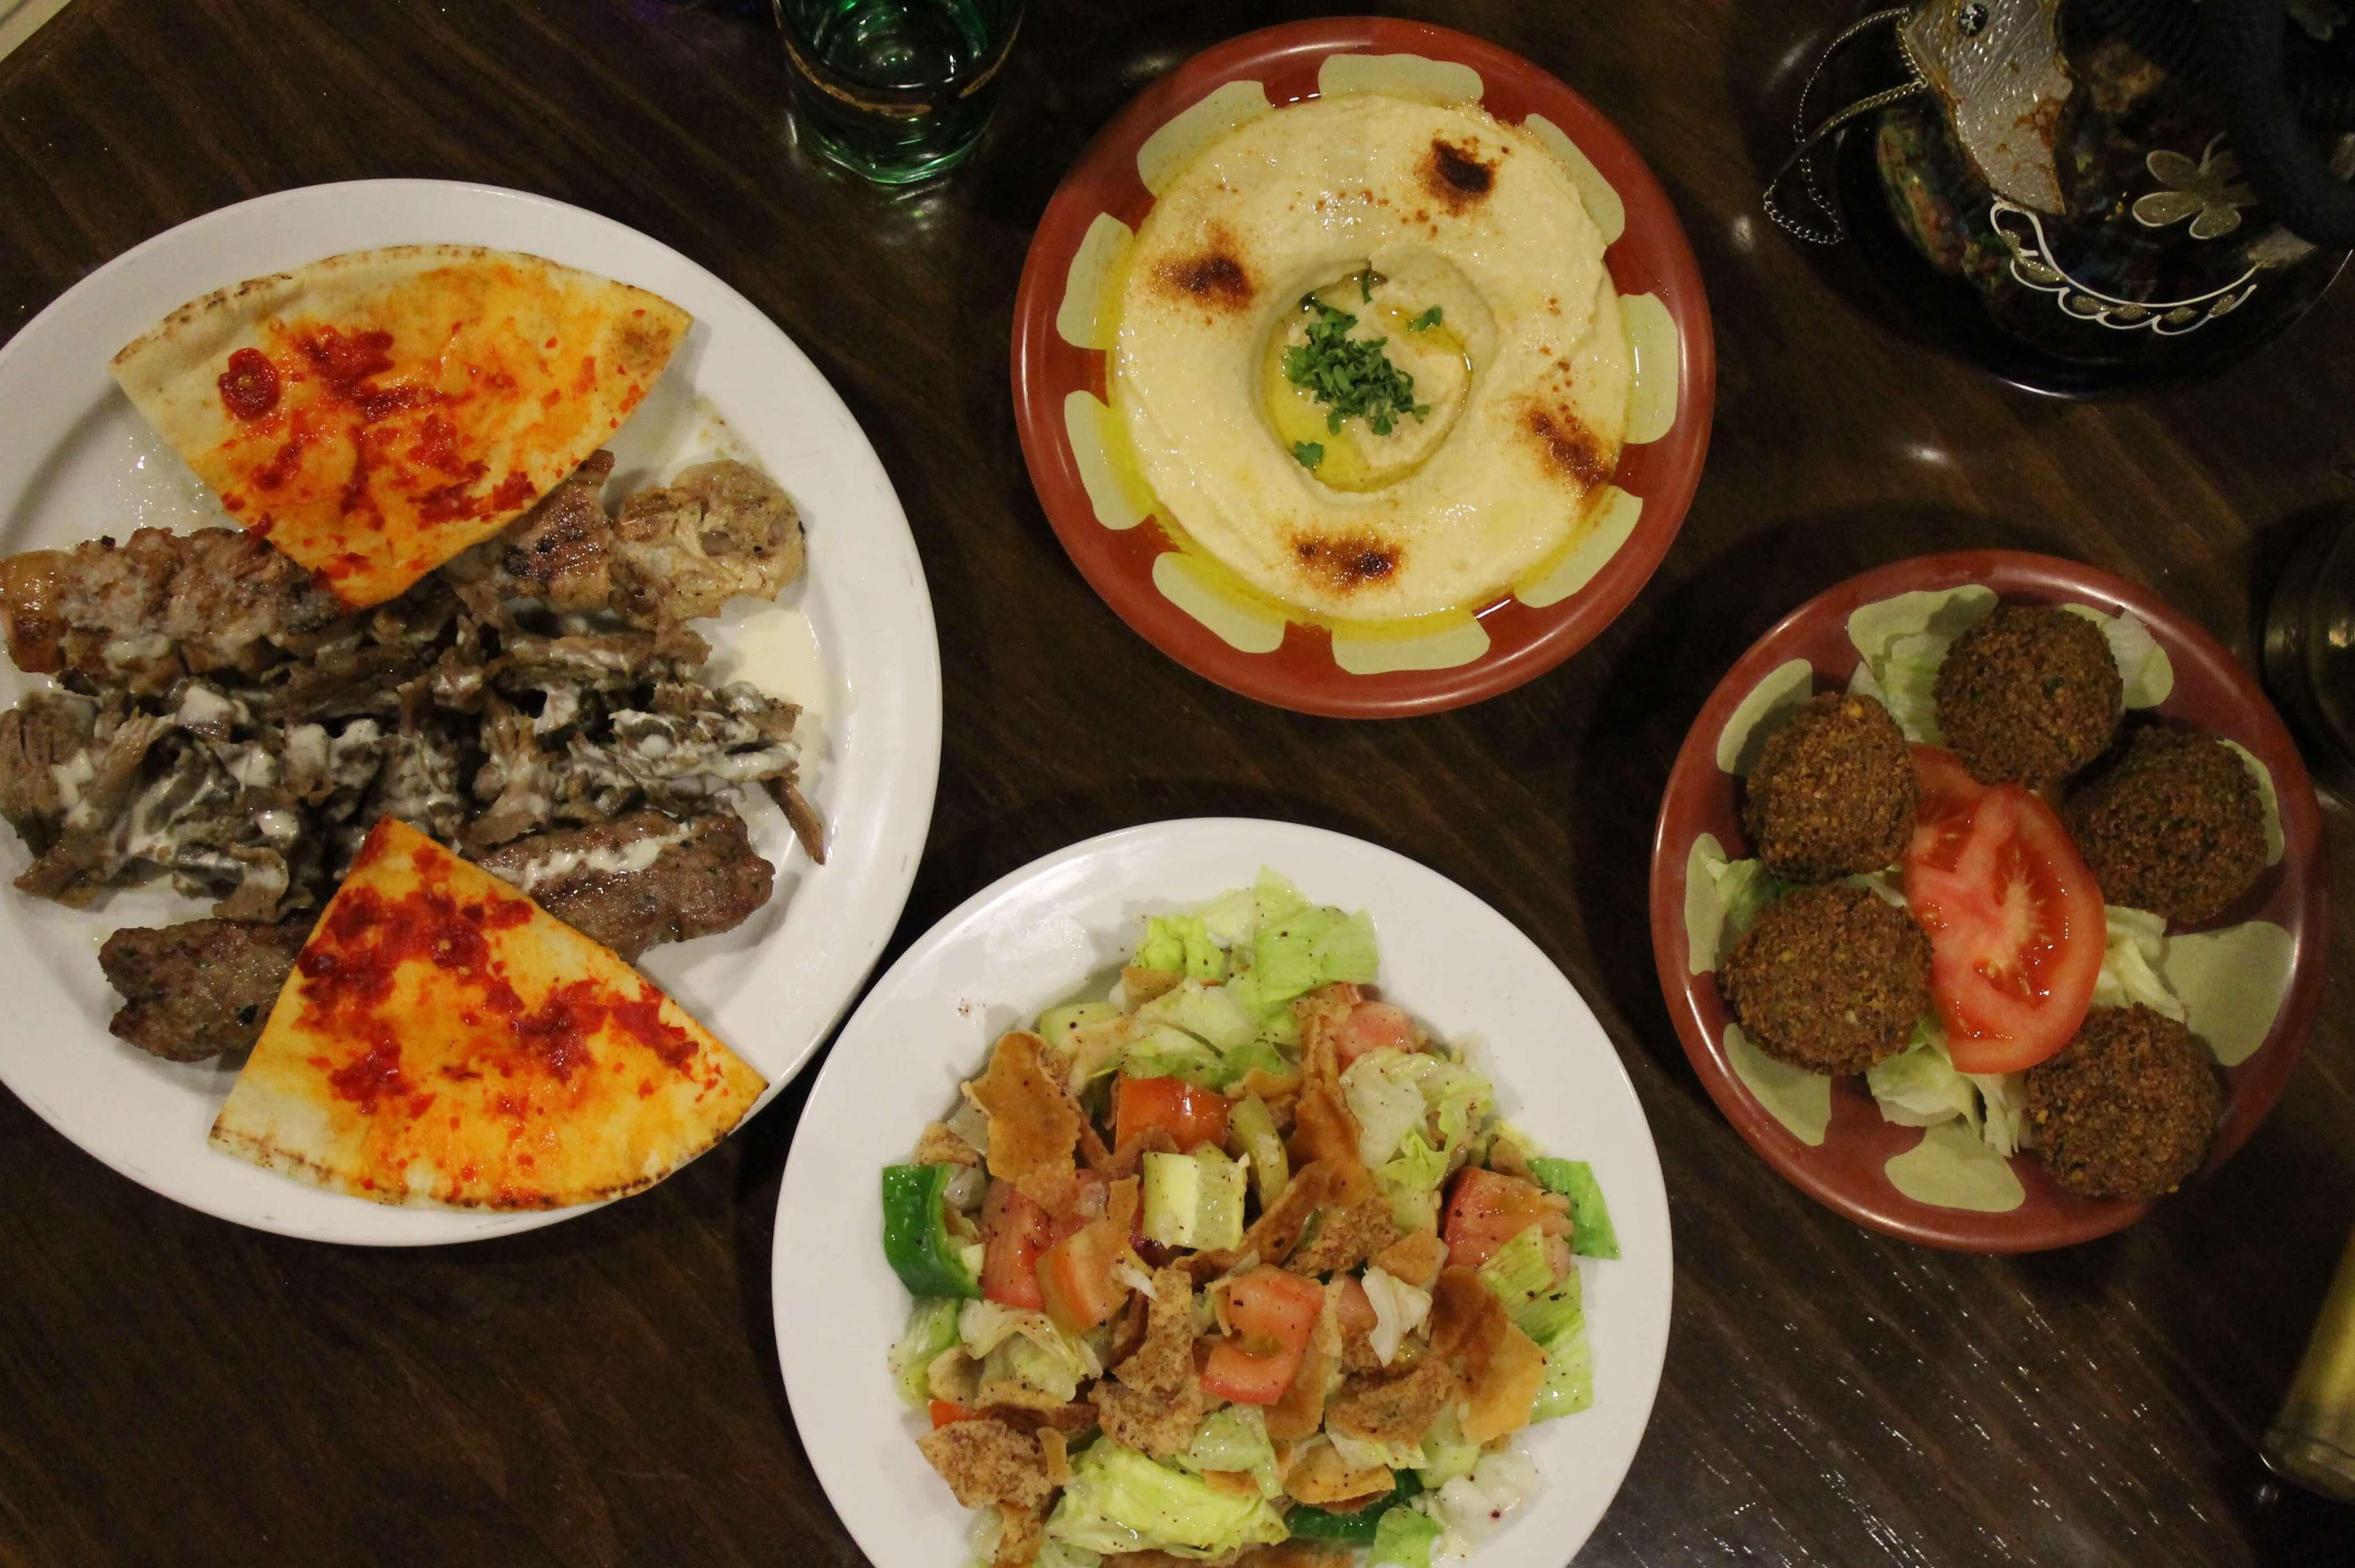 Pincho variado, hummus, ensalada fatush y falafel - Restaurante Mataró - Les Mil i Una Nits